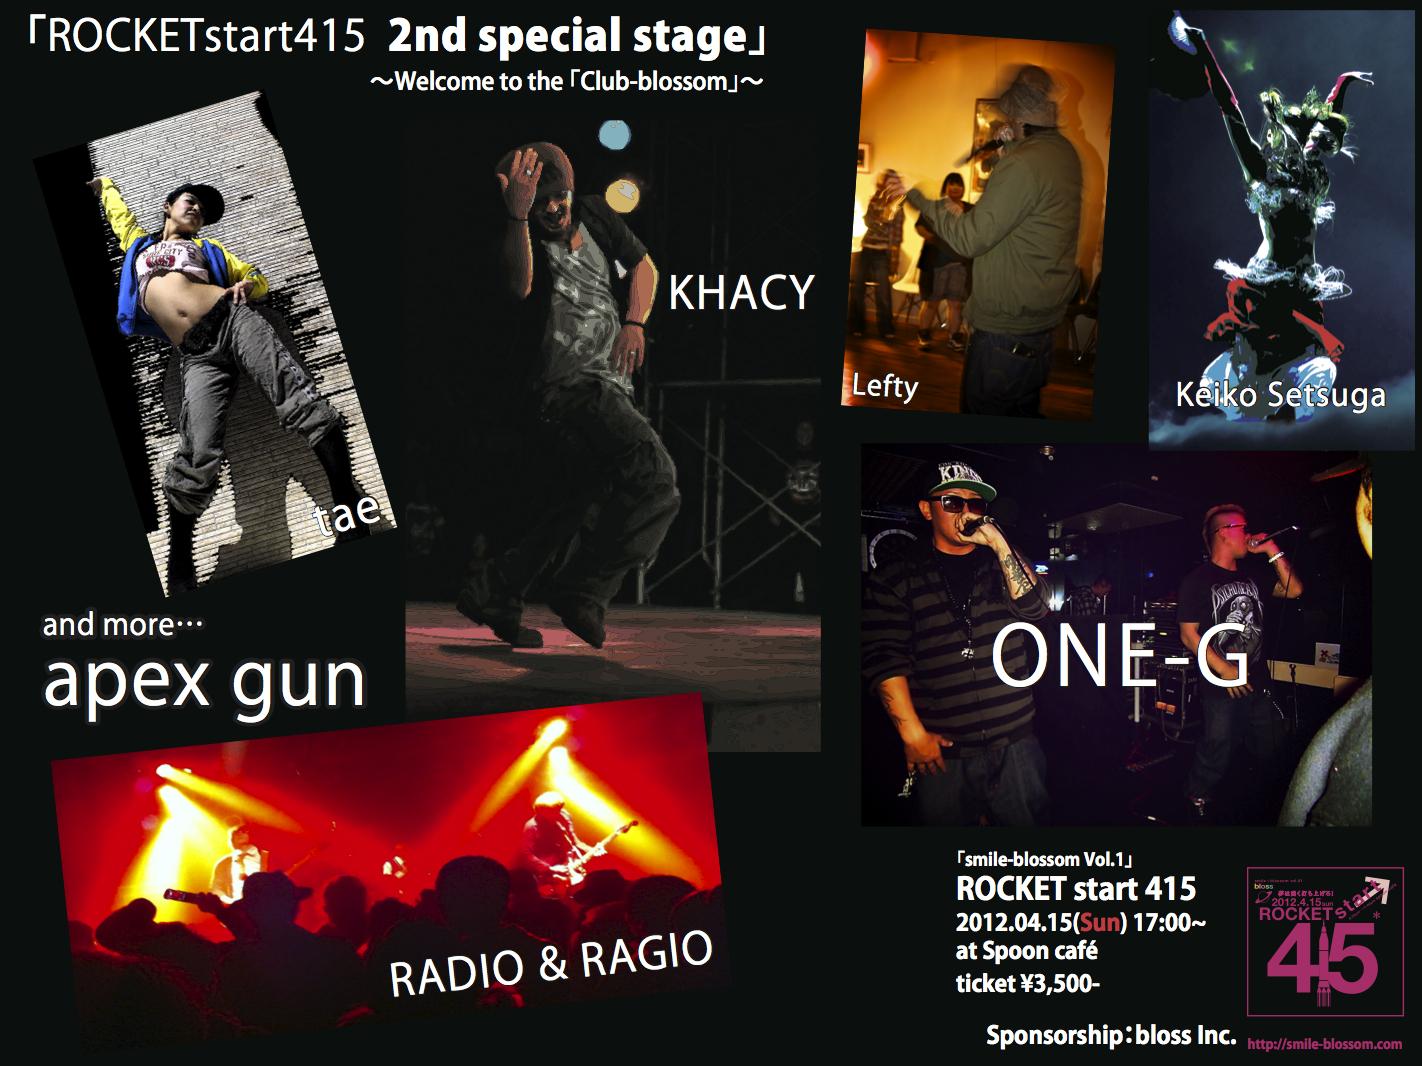 ROCKETstart415 ~2nd Stage ゲスト紹介編~